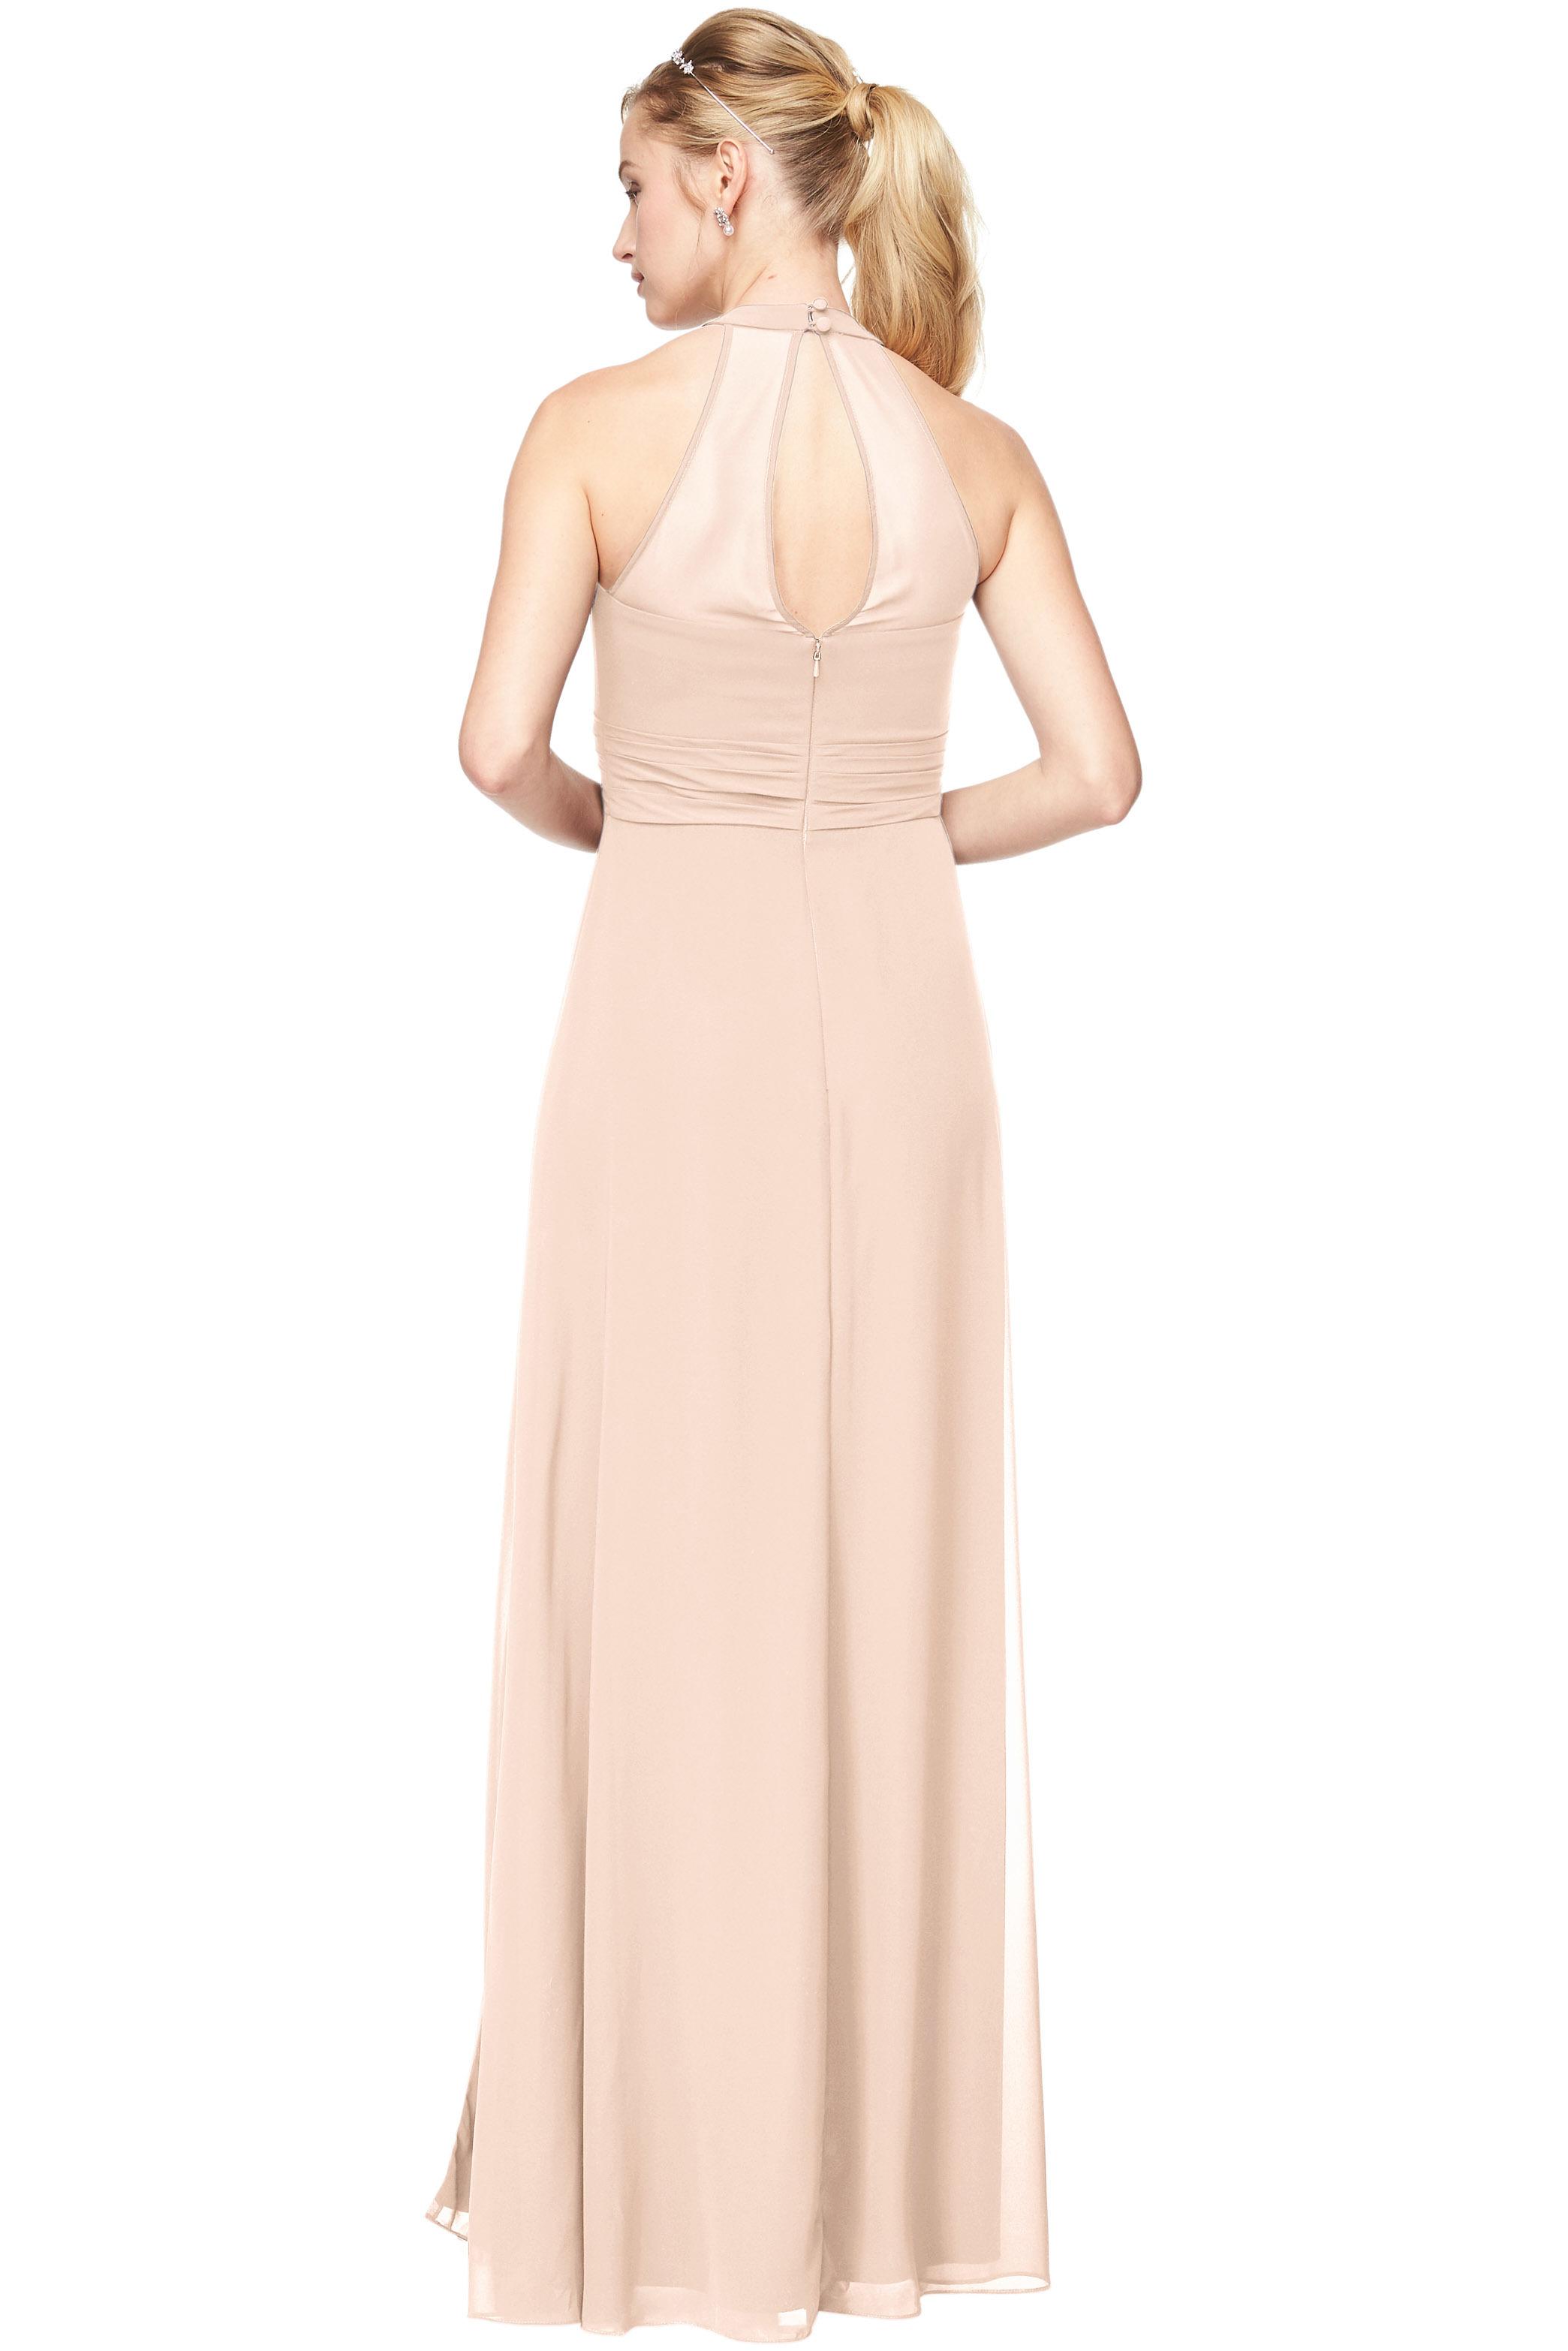 Bill Levkoff SHELL PINK Chiffon V-Neck A-Line gown, $198.00 Back